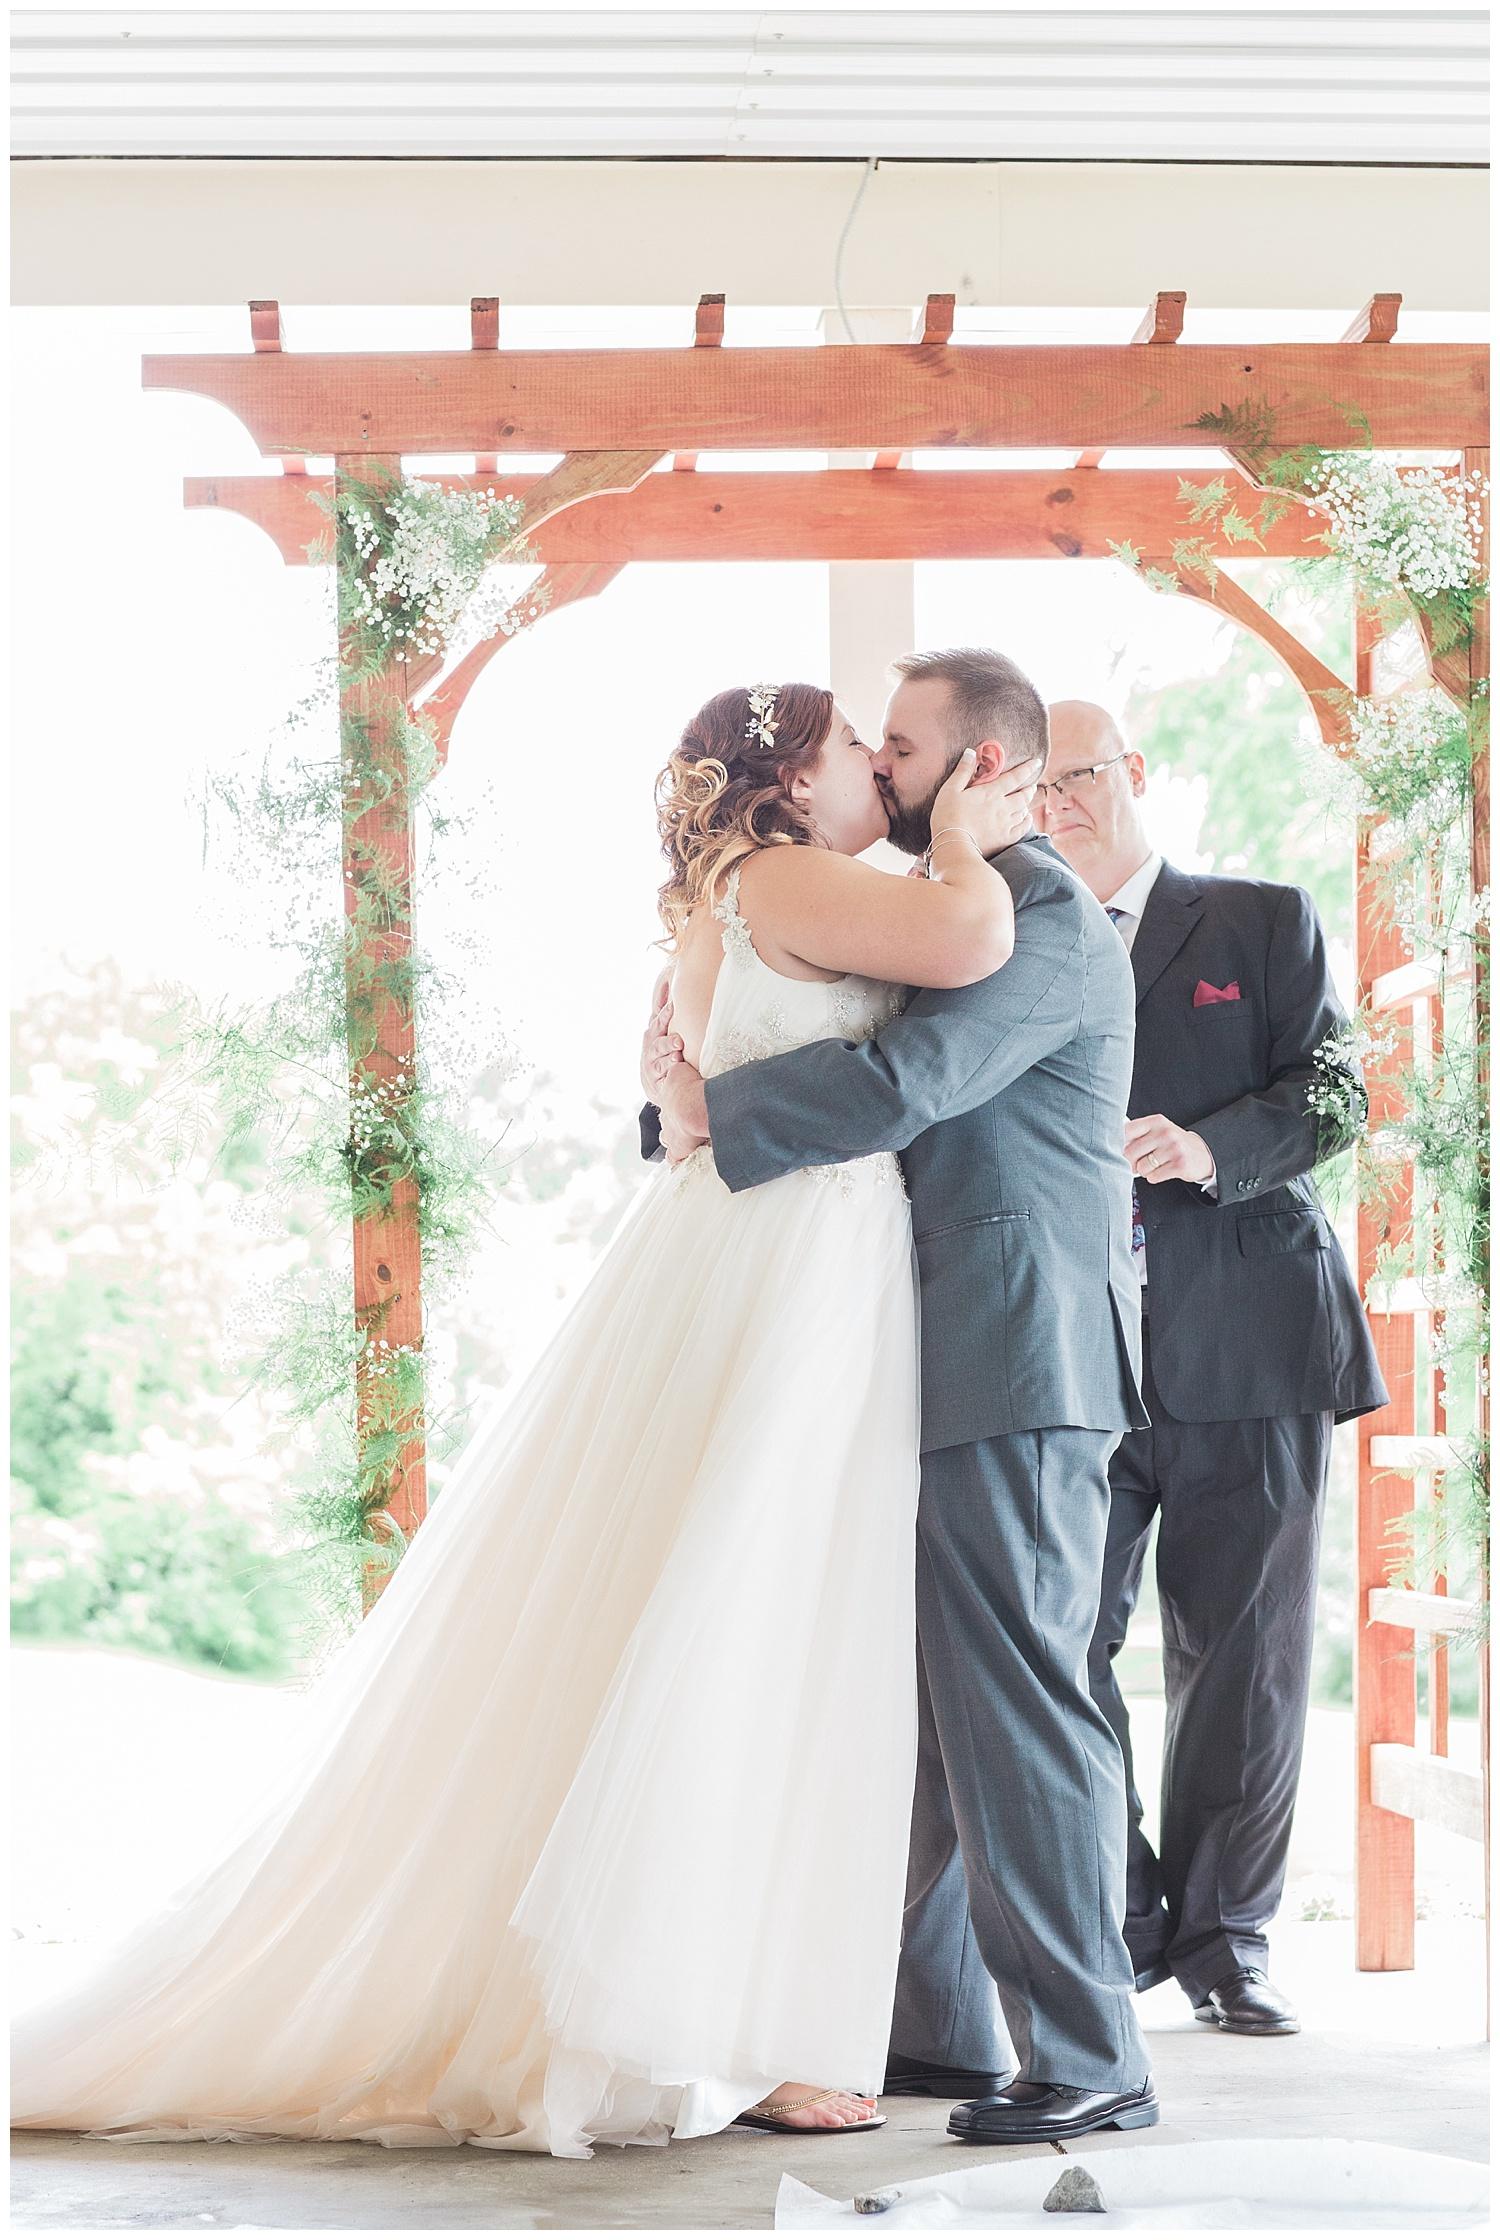 Brian and Molly Wed in Conesus NY - Lass & Beau-321_Buffalo wedding photography.jpg